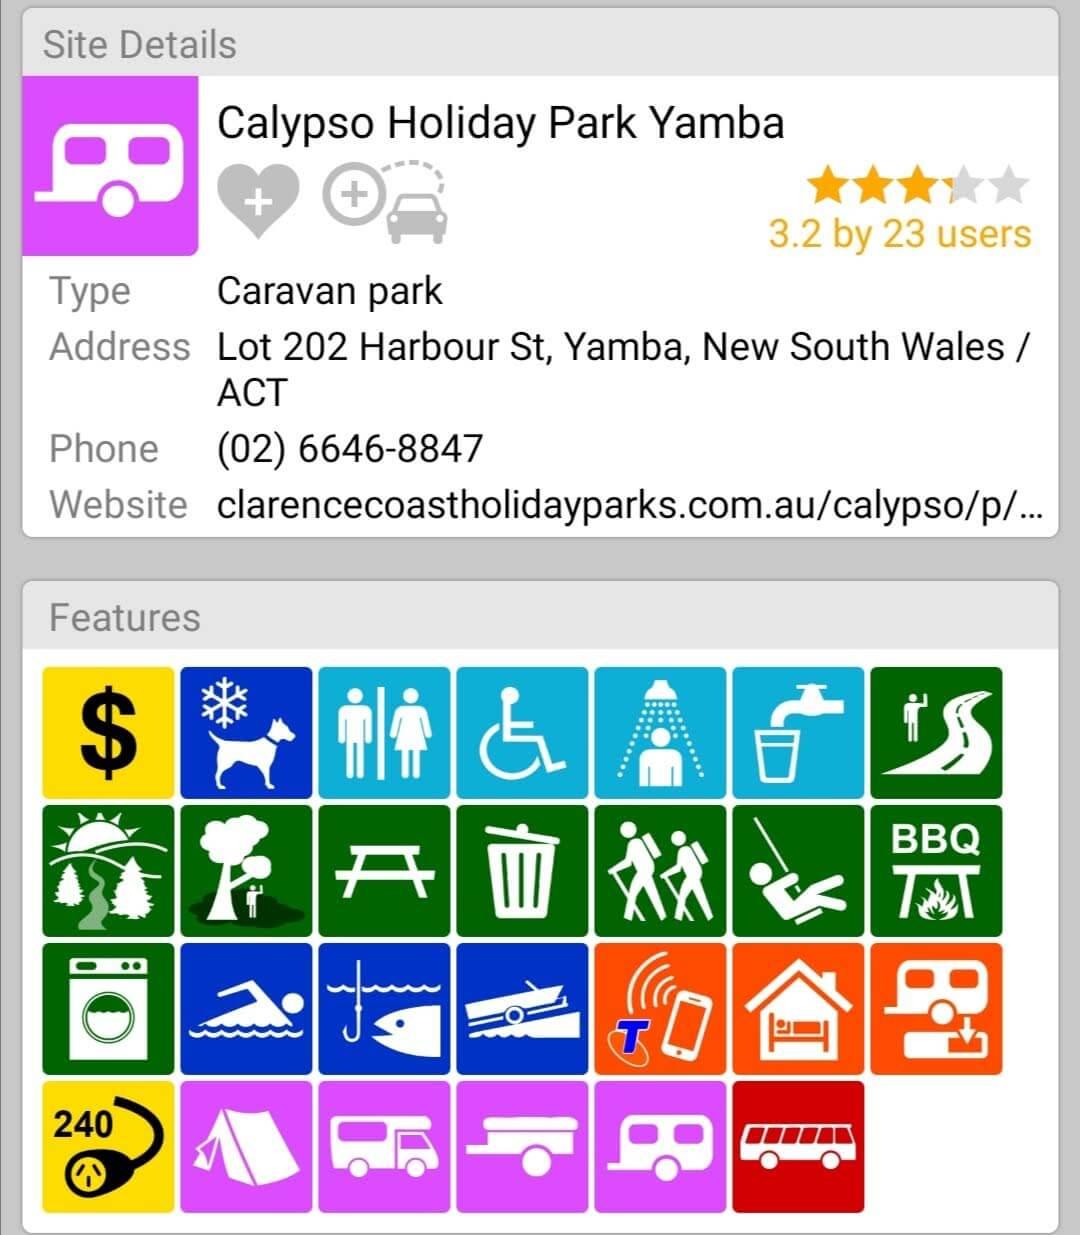 Calypso Holiday Park Yamba